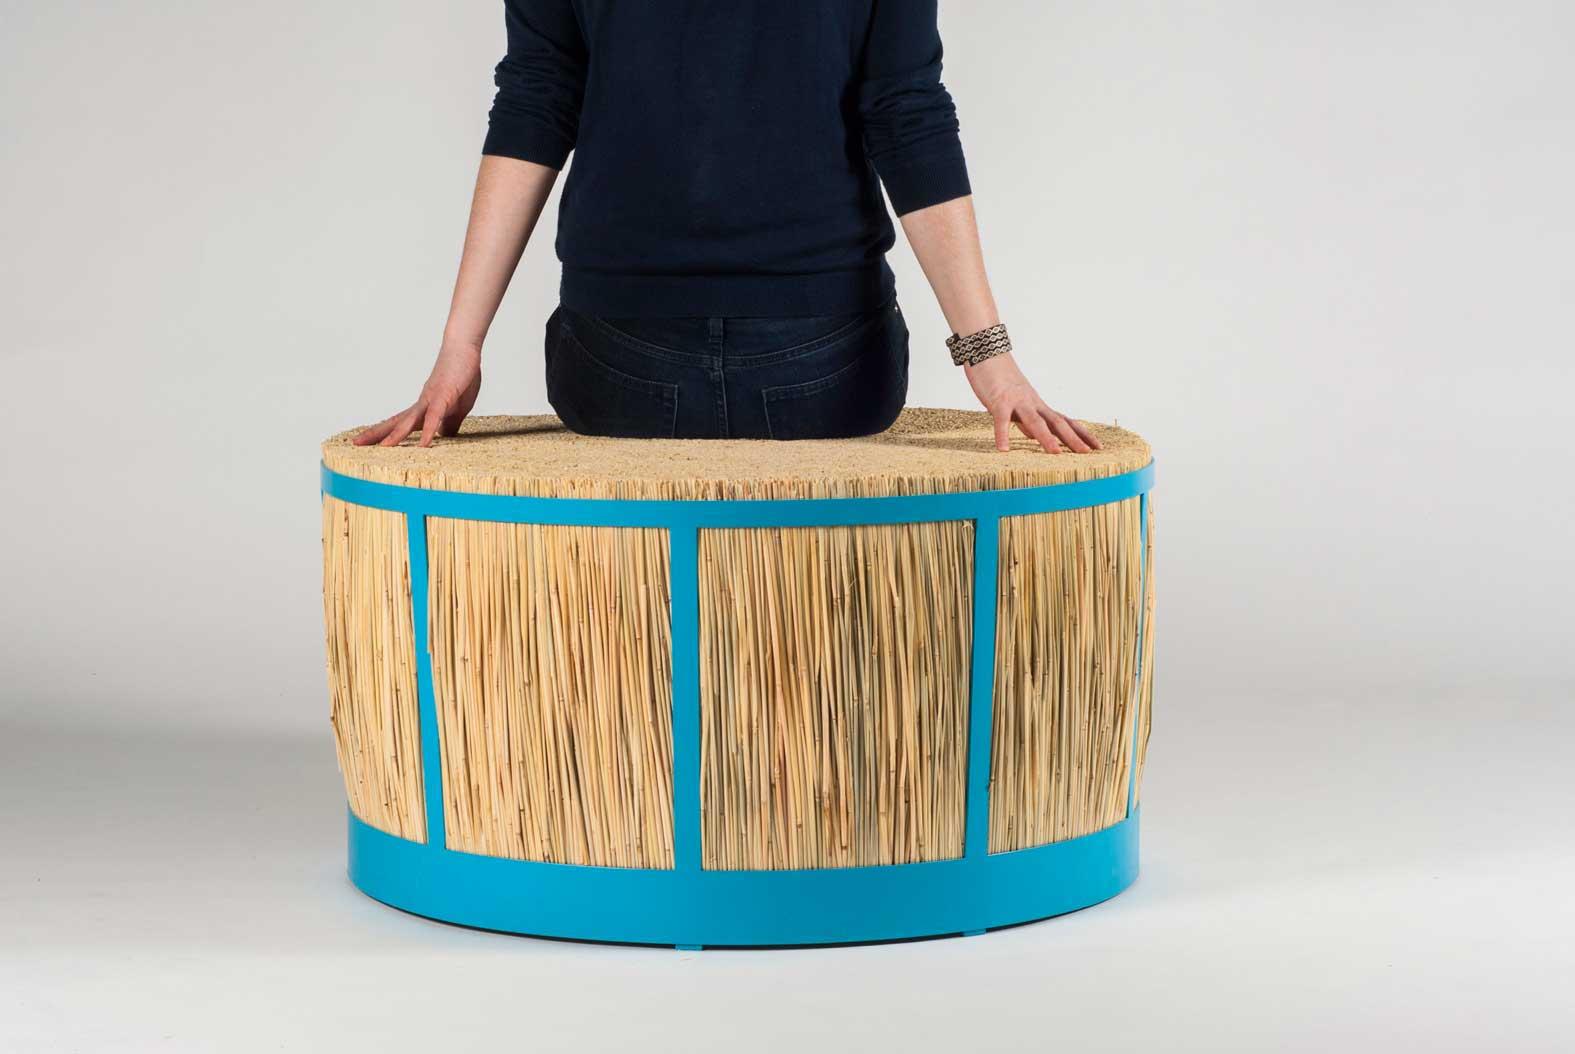 straw stool by juan cappa wood furniture